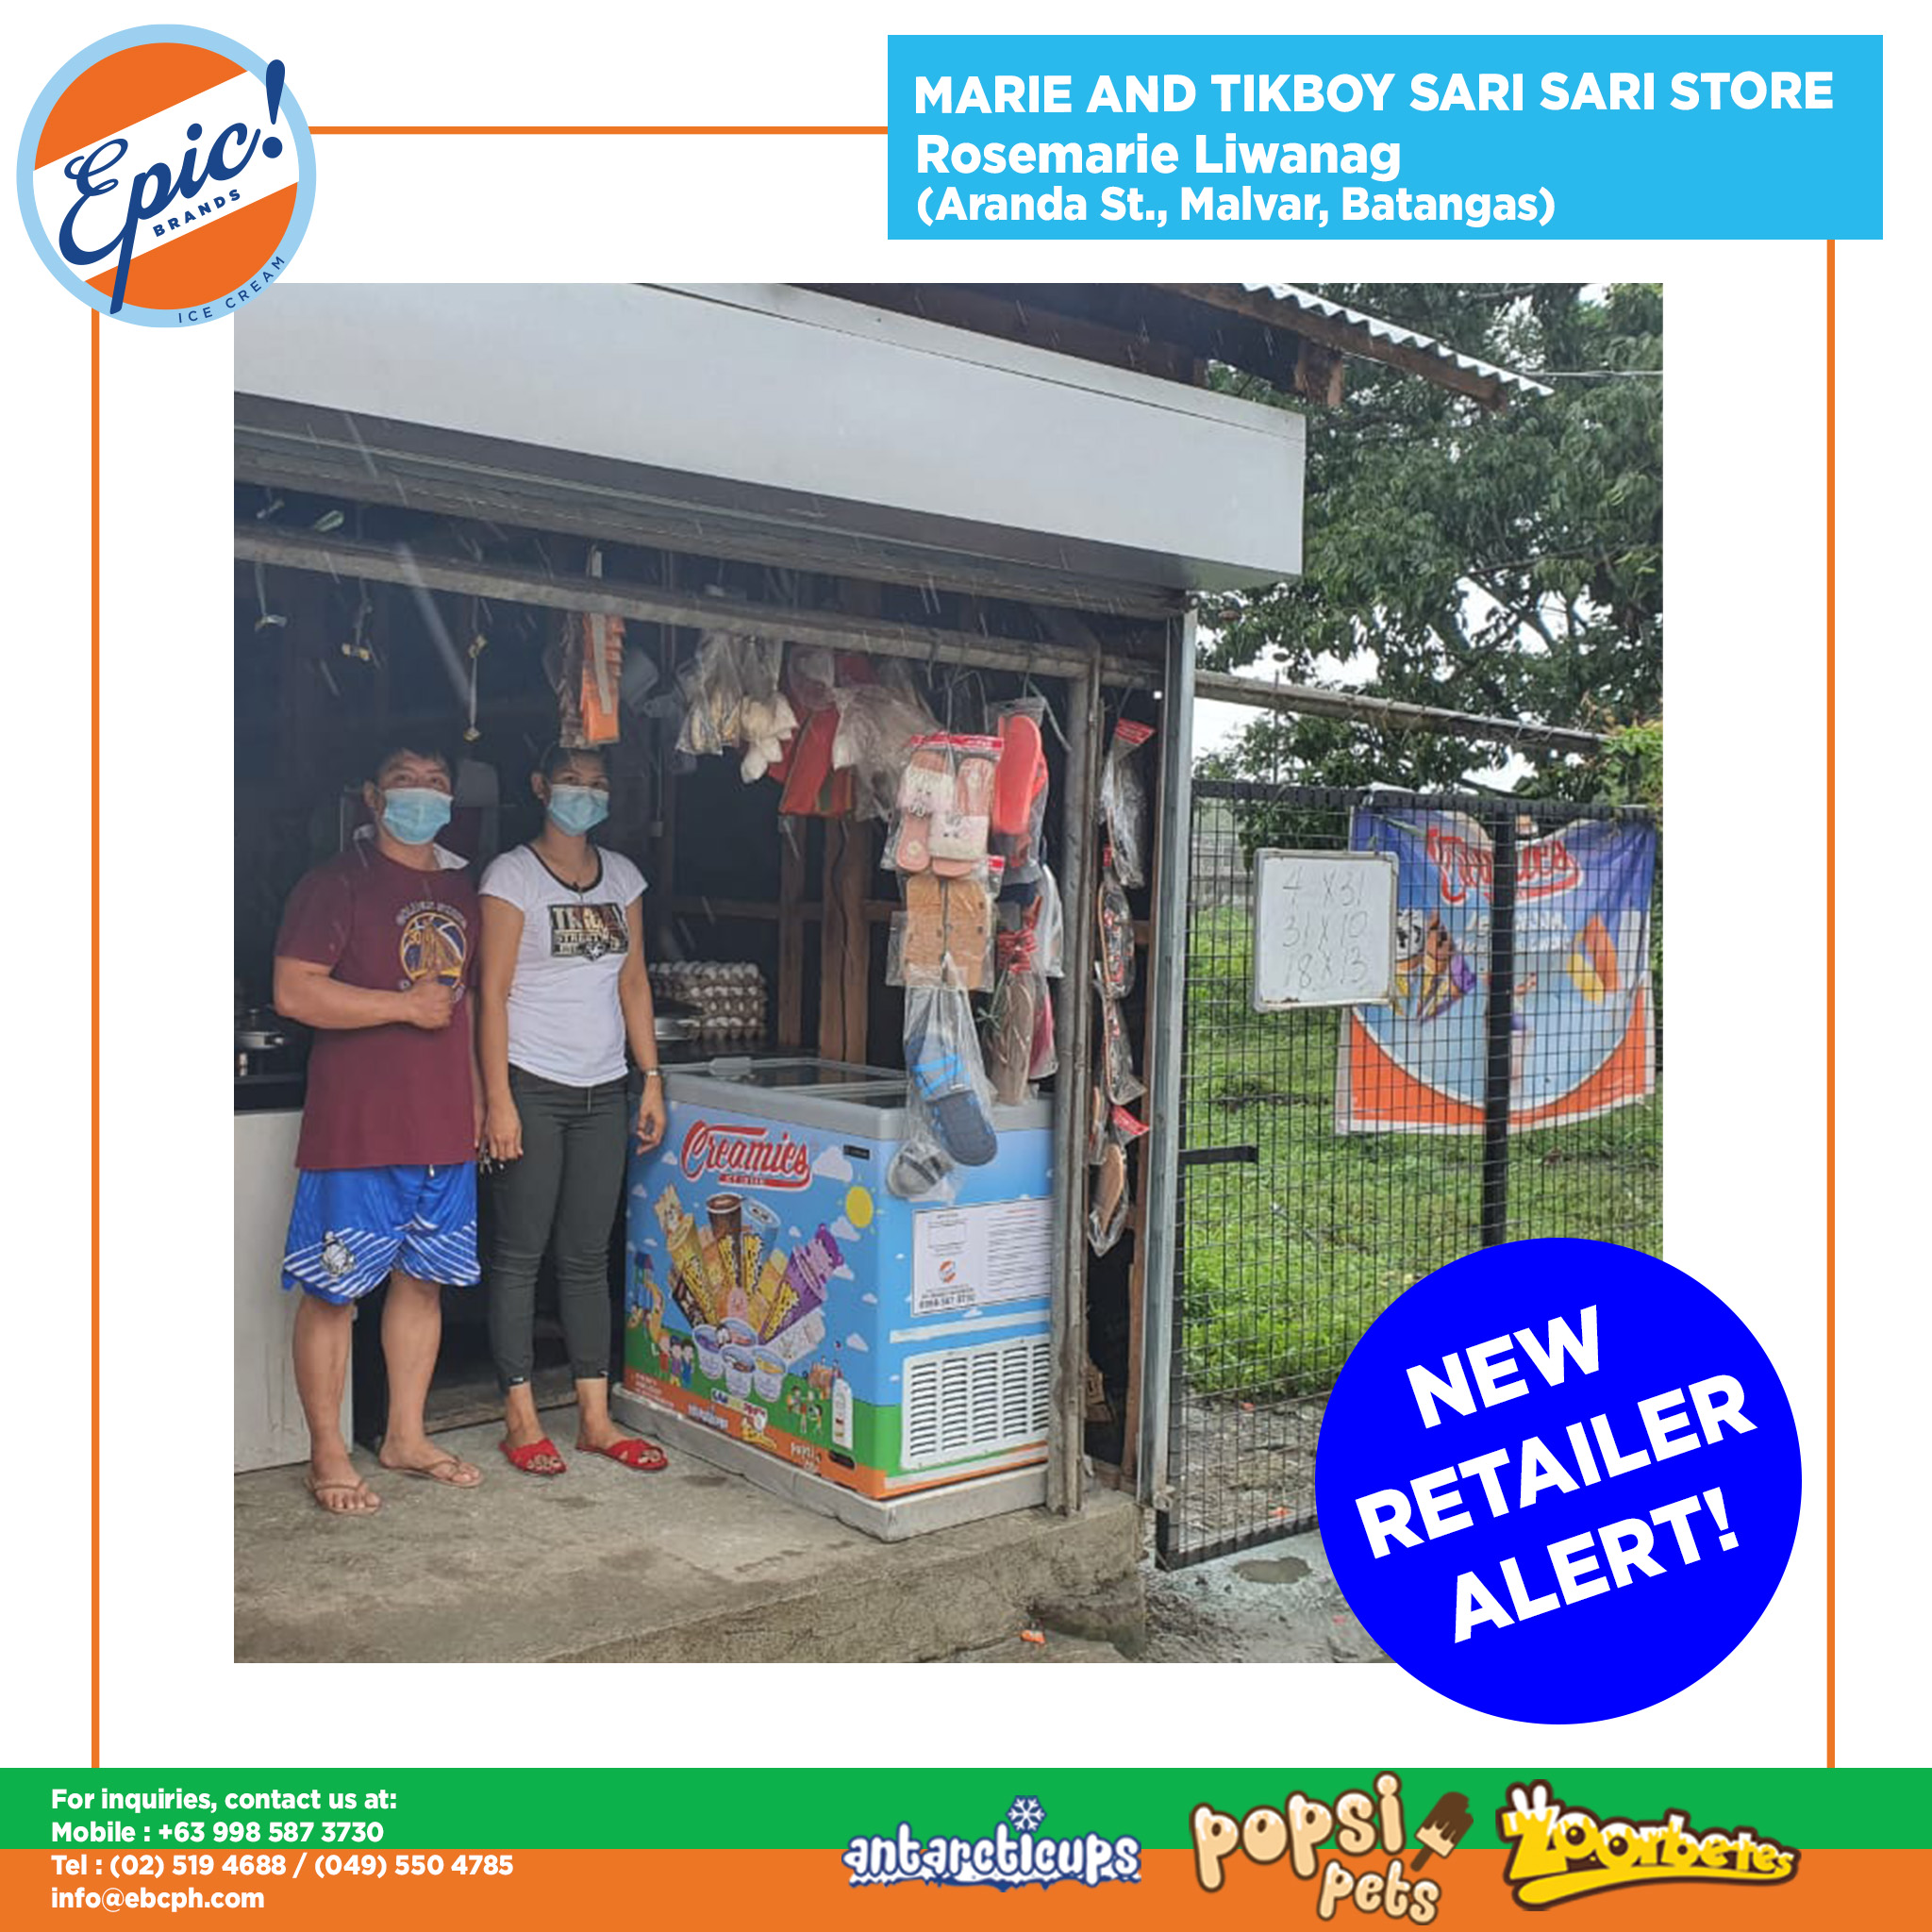 Marie and Tikboy Sari Sari Store